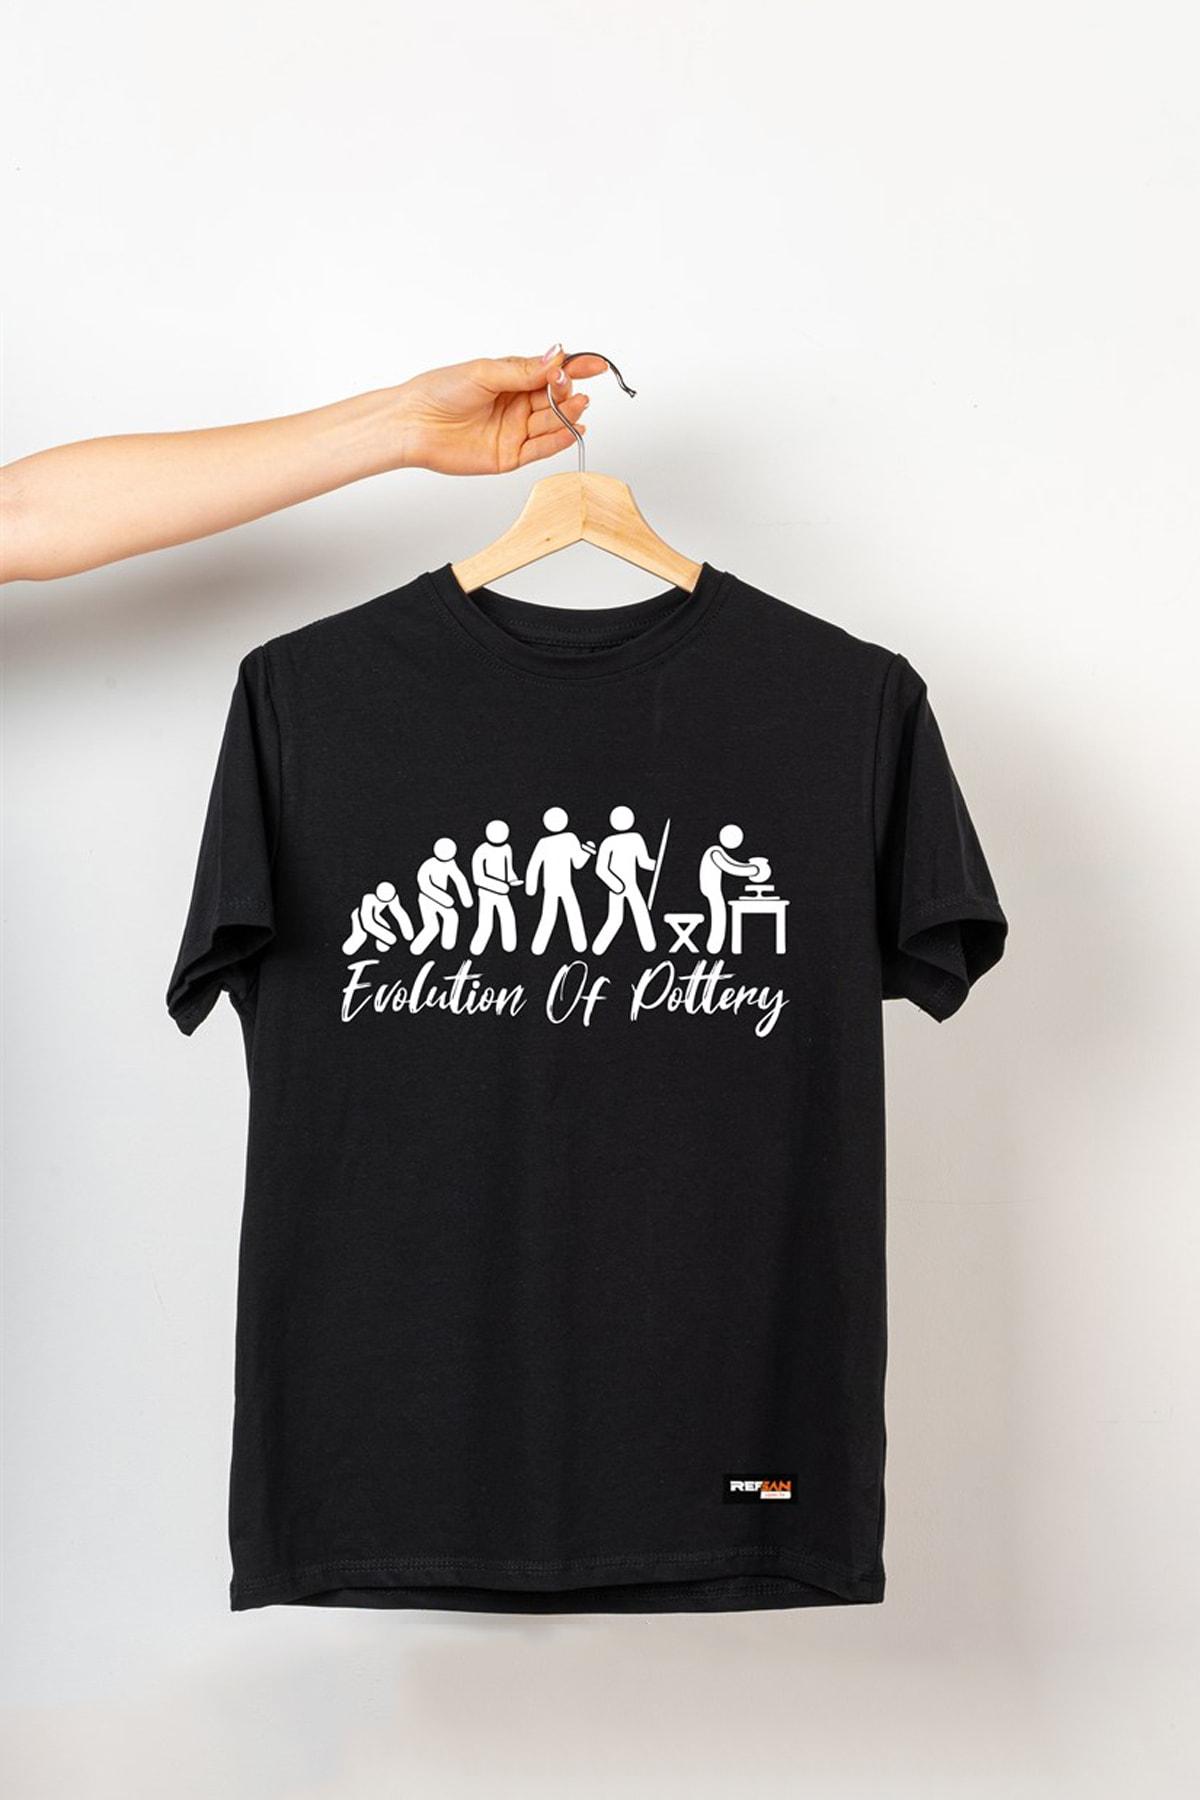 Ref-San Unisex Siyah Tasarım T-shirt - Evolution Of Pottery 1